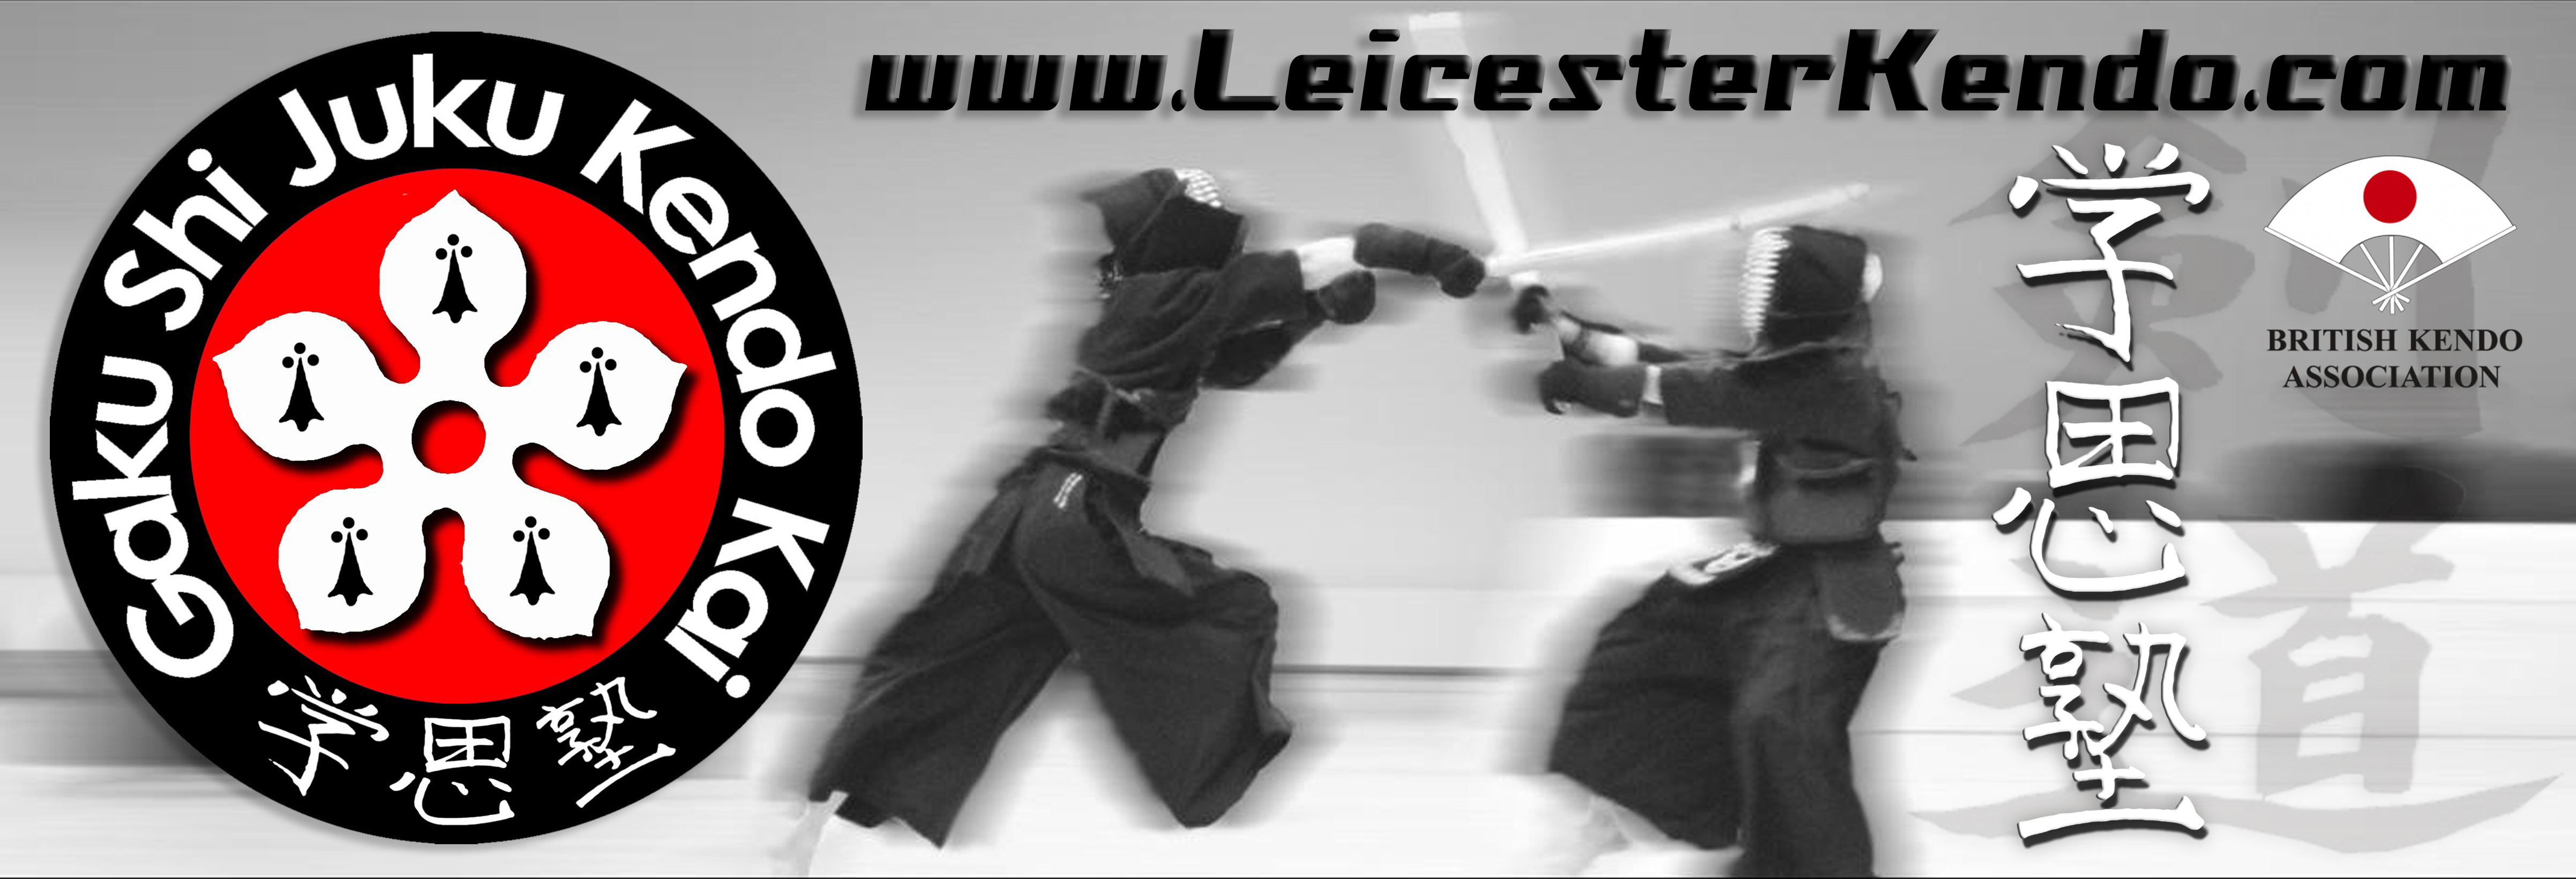 LeicesterKendo